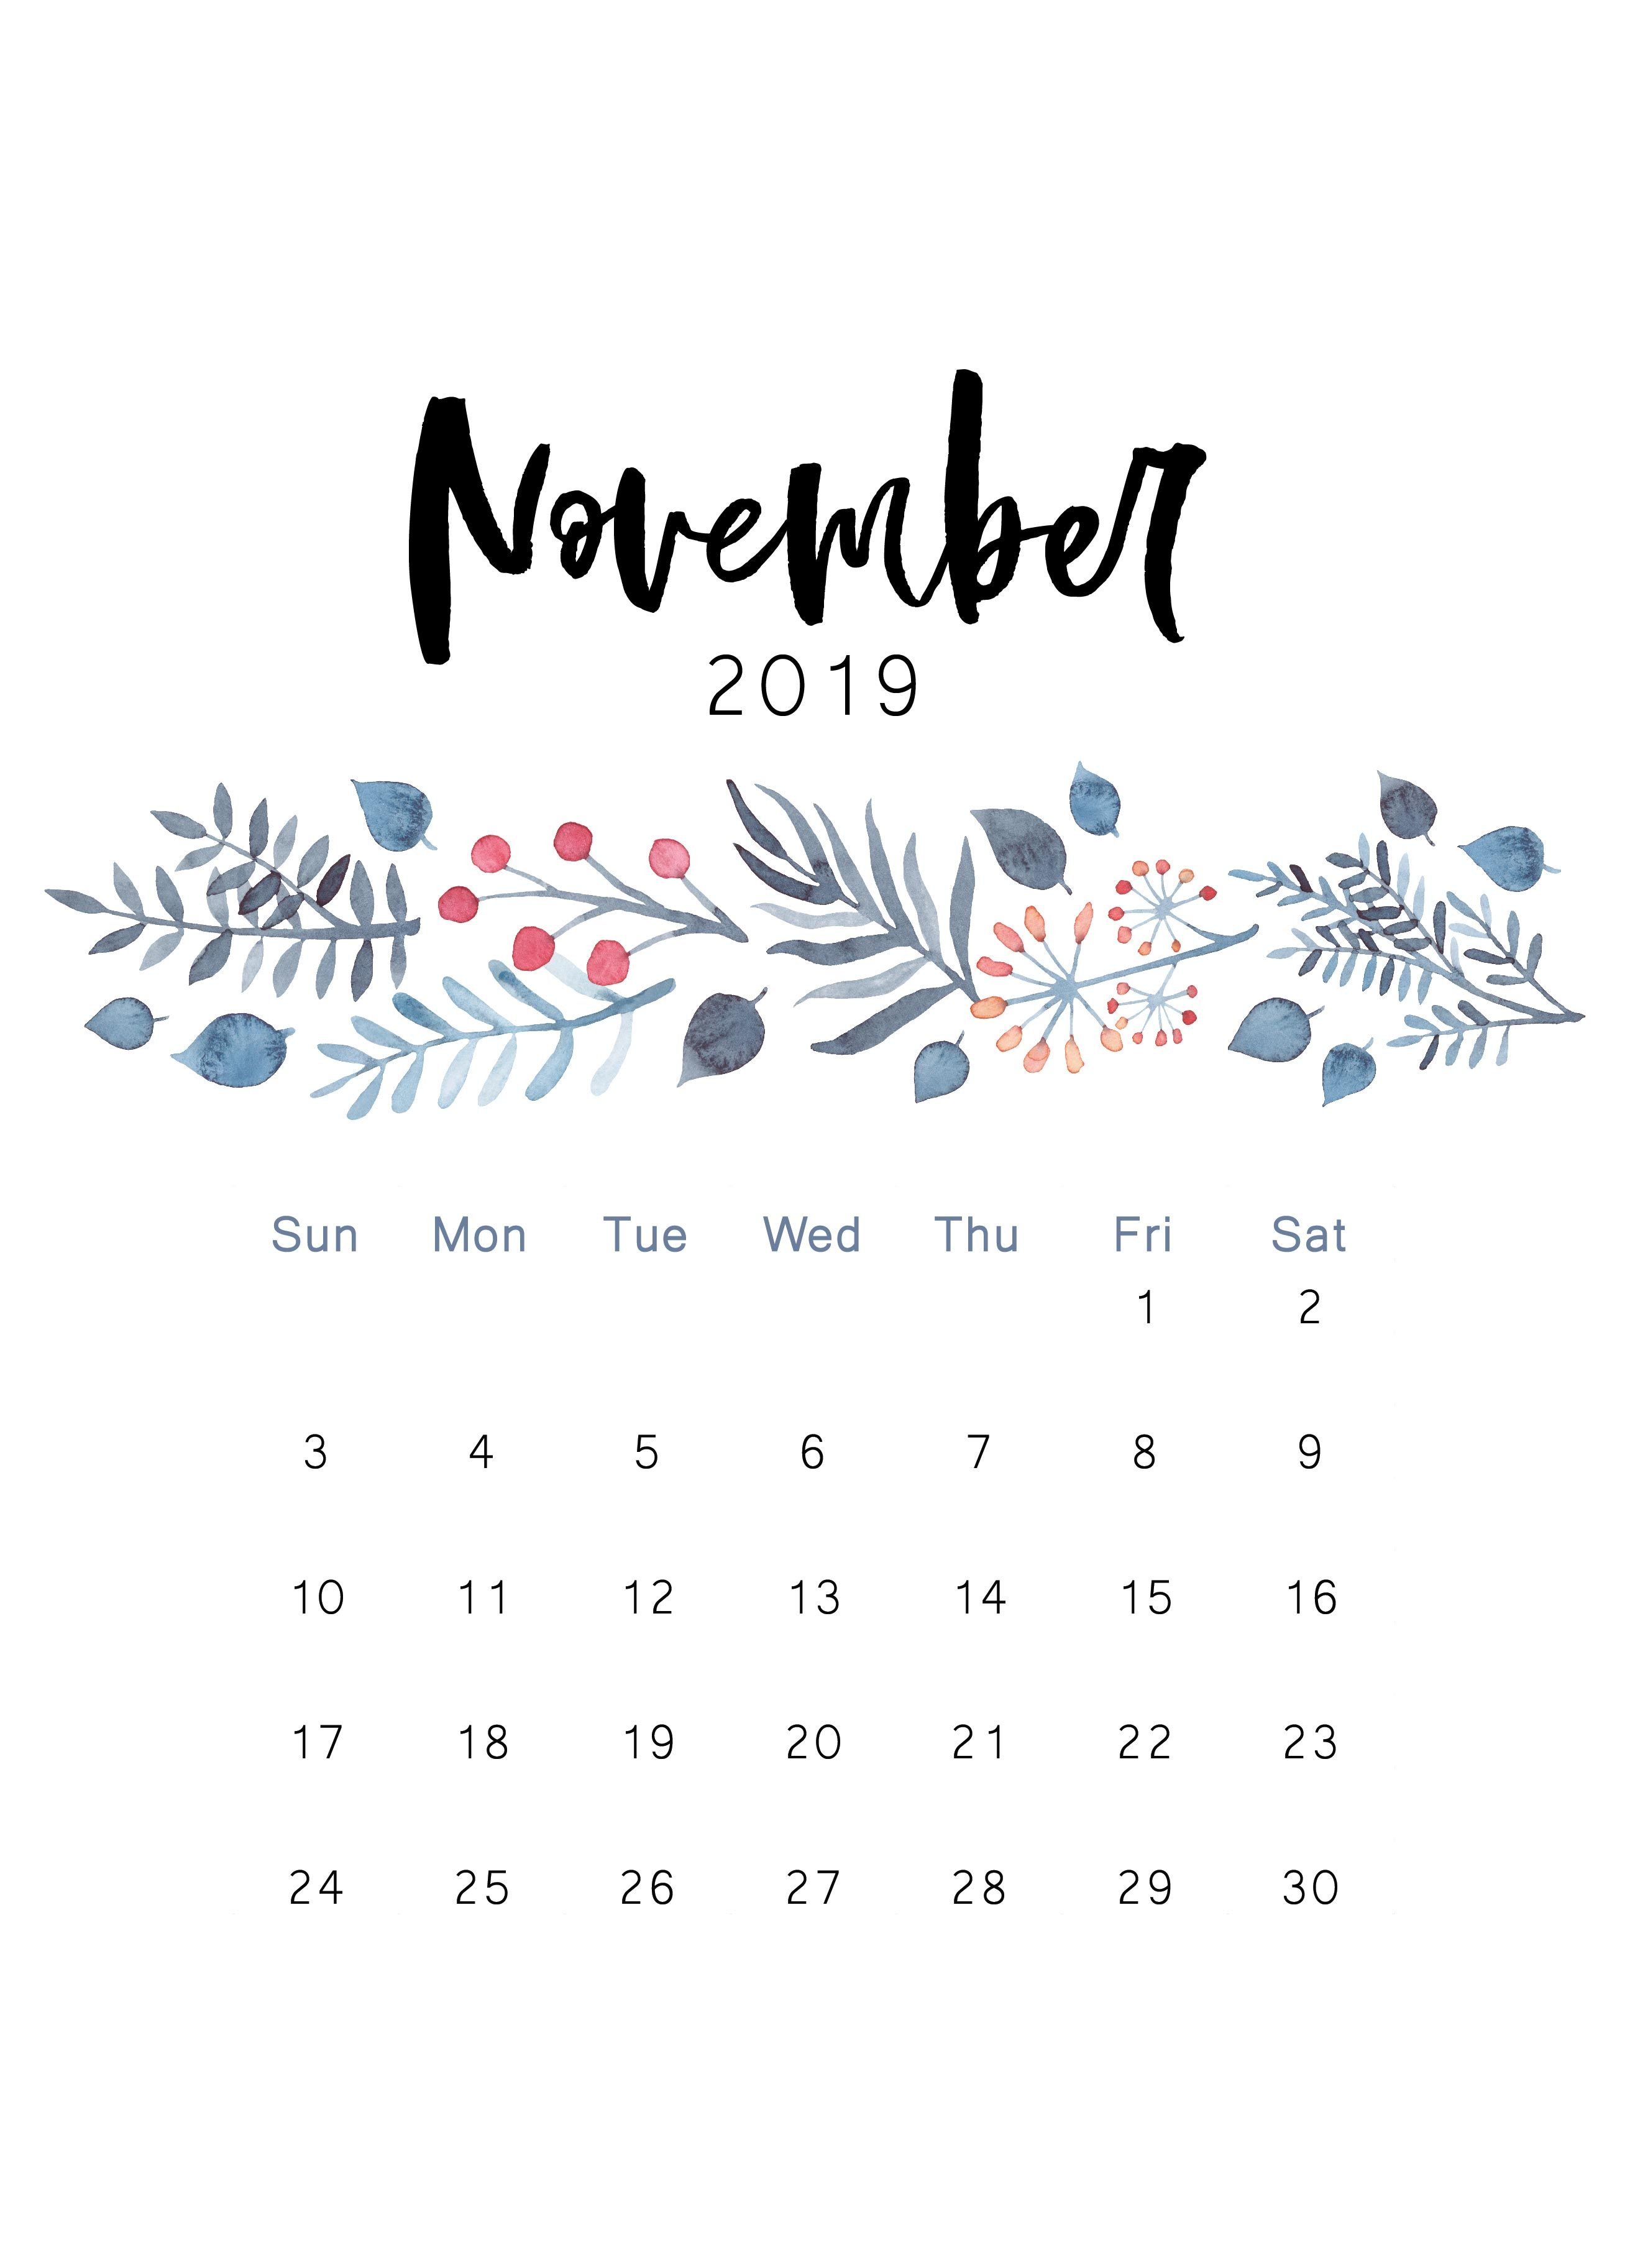 Free 2019 Printable Calendar | Календарь, Печатные Календари